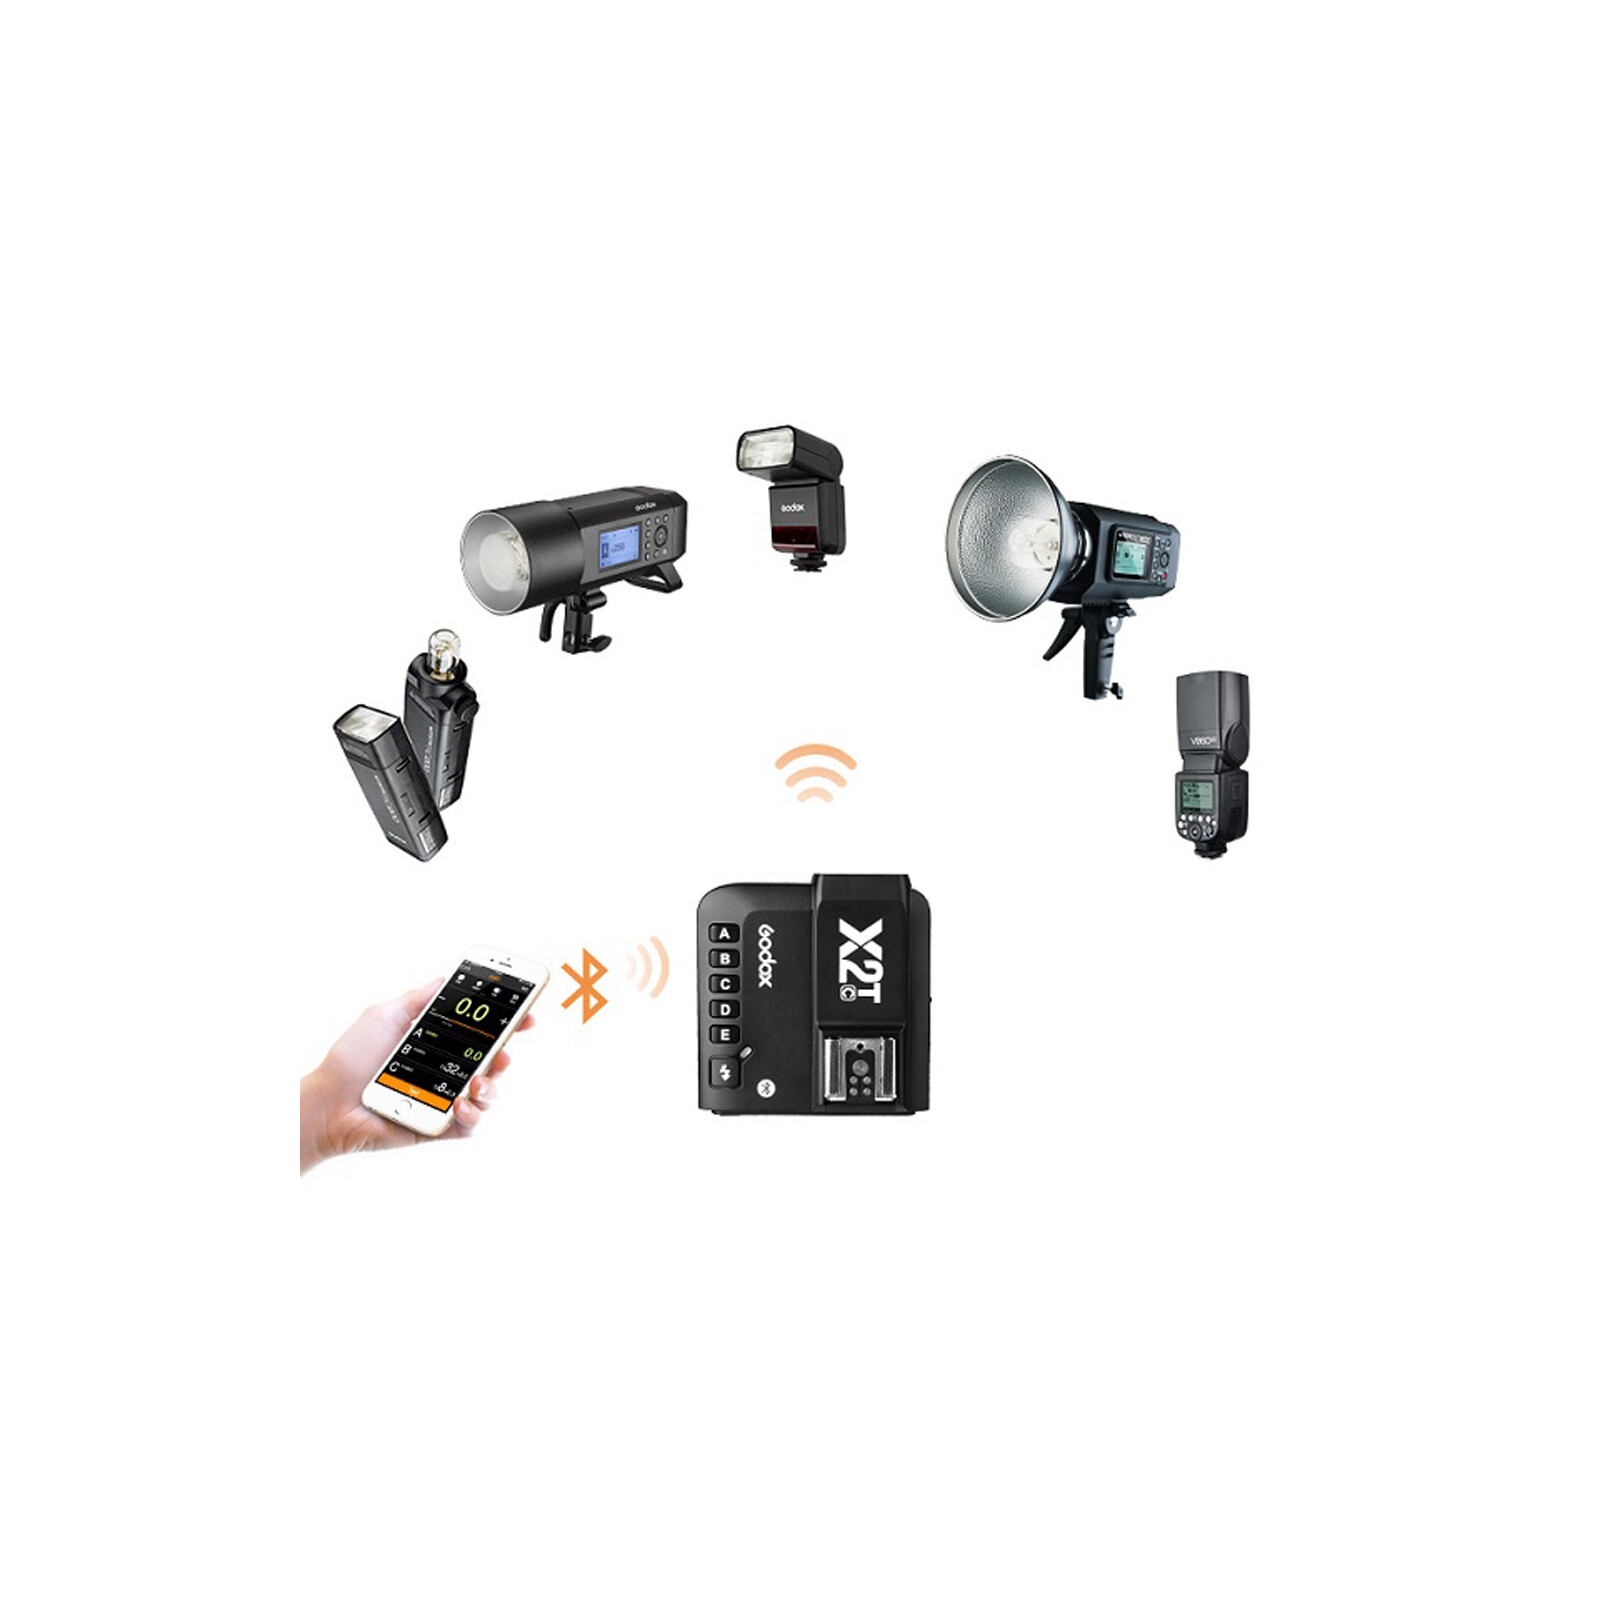 GODOX X2 2.4G TTL Flash Trigger Sony